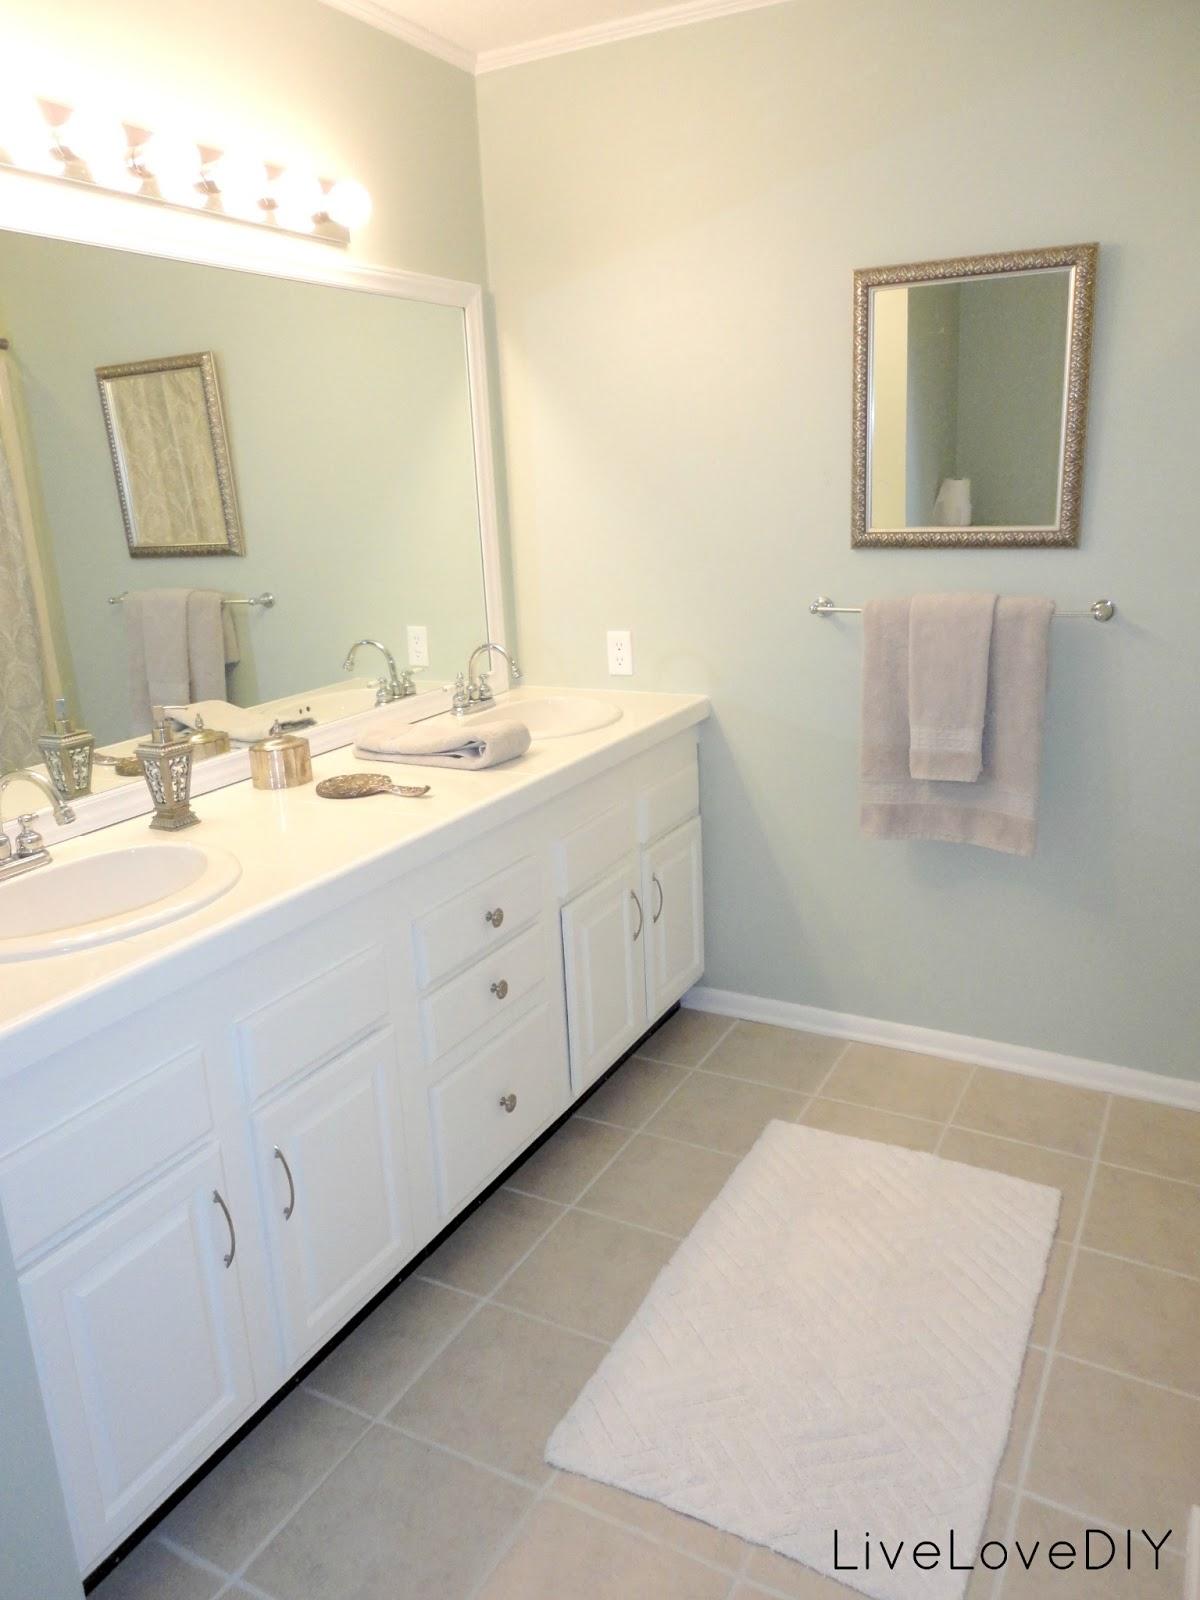 Bathrooms For Older People | Decoration News